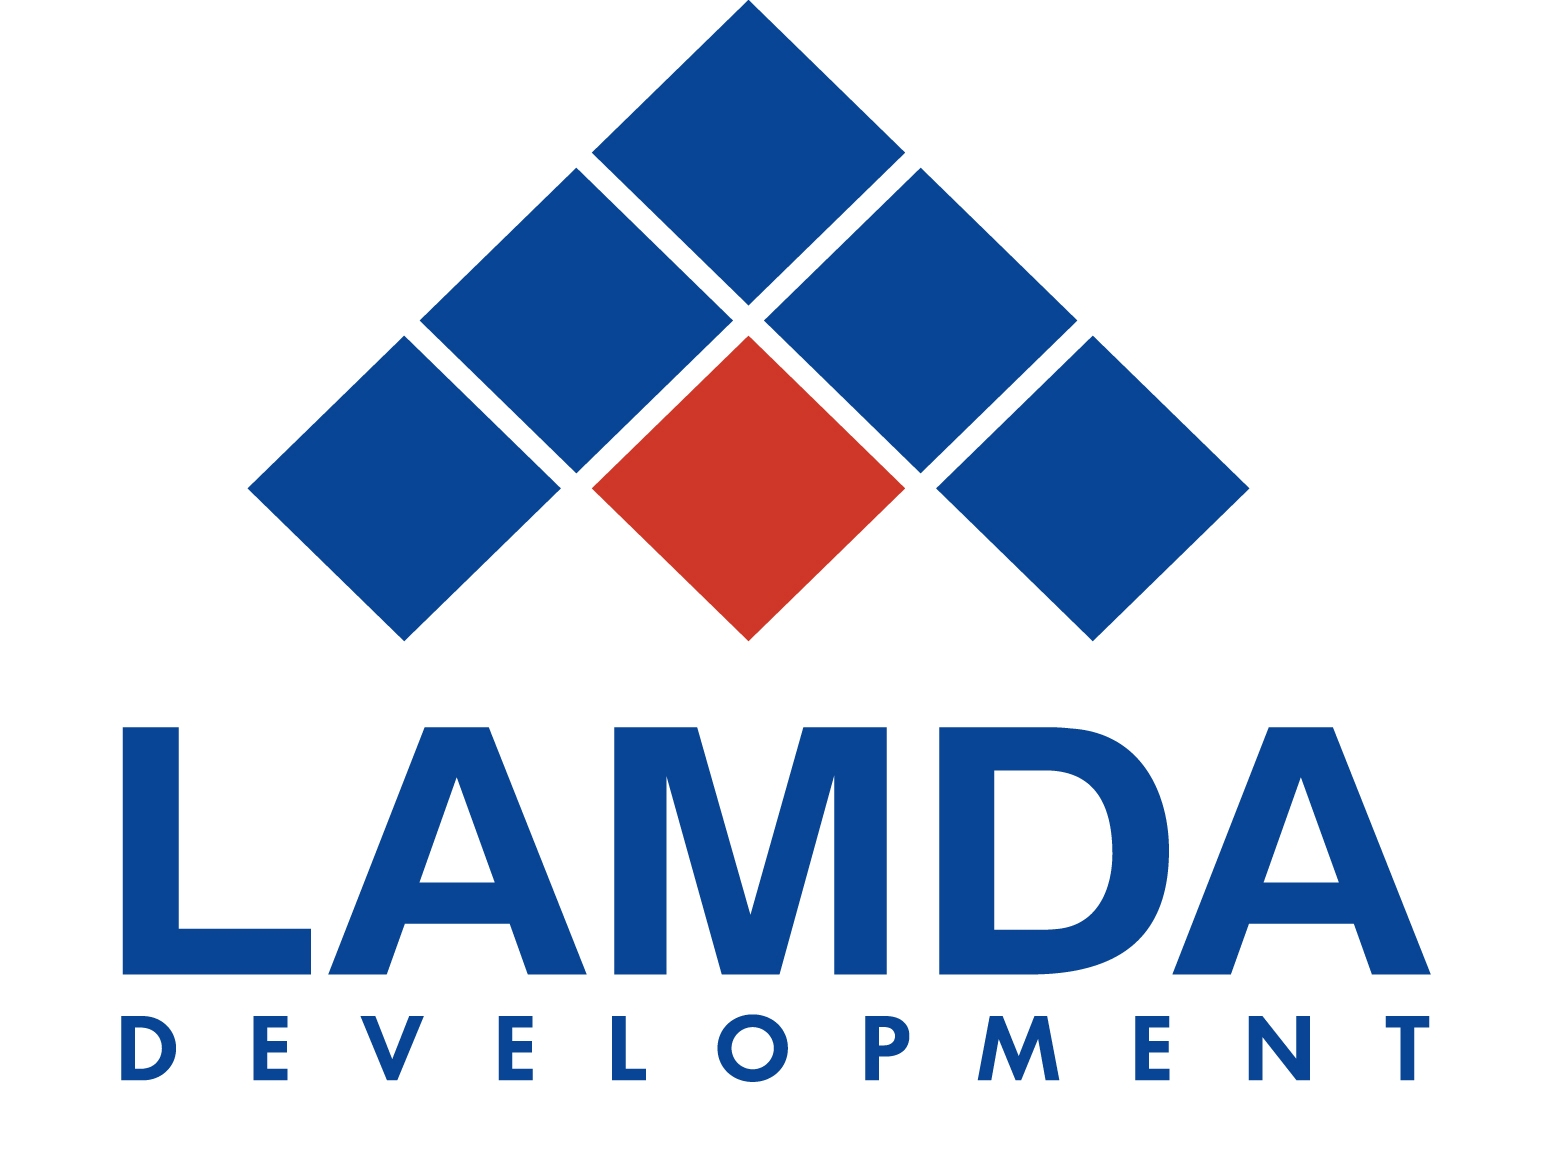 Lamda Development: Στα 19,5 εκατ. ευρώ τα EBITDA στο α' εξάμηνο του 2020